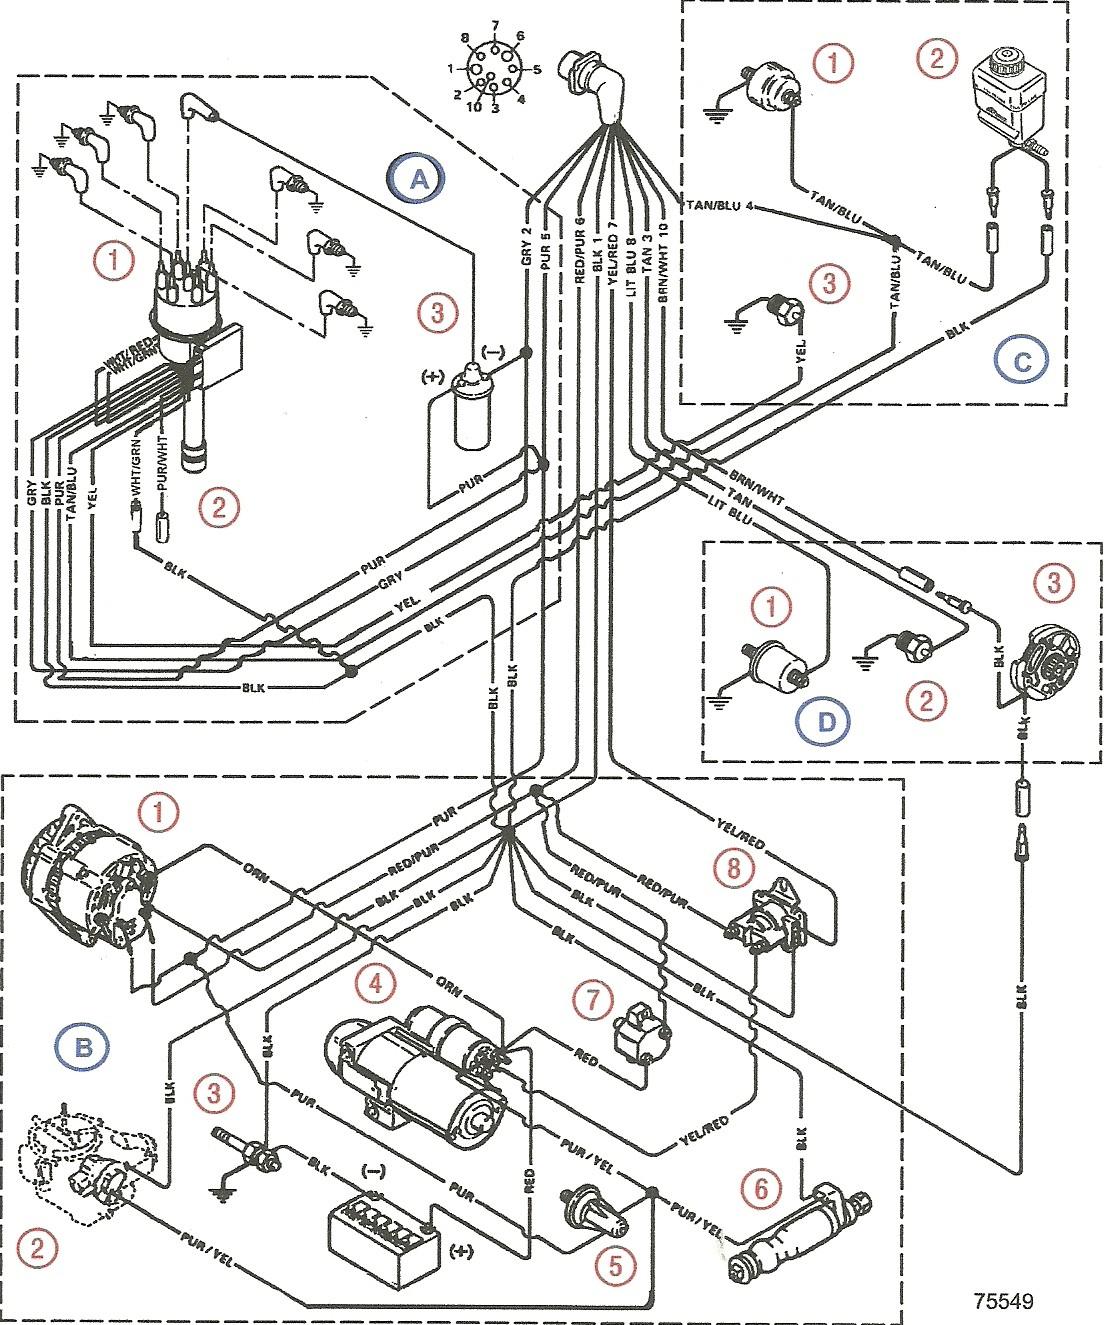 rc_5222] 4 3 mercruiser starter wiring diagram download diagram mercruiser 3 0 wiring diagram mercruiser 3.0 distributor diagram xolia sapre swas atolo stic nerve vish push rine tixat ...